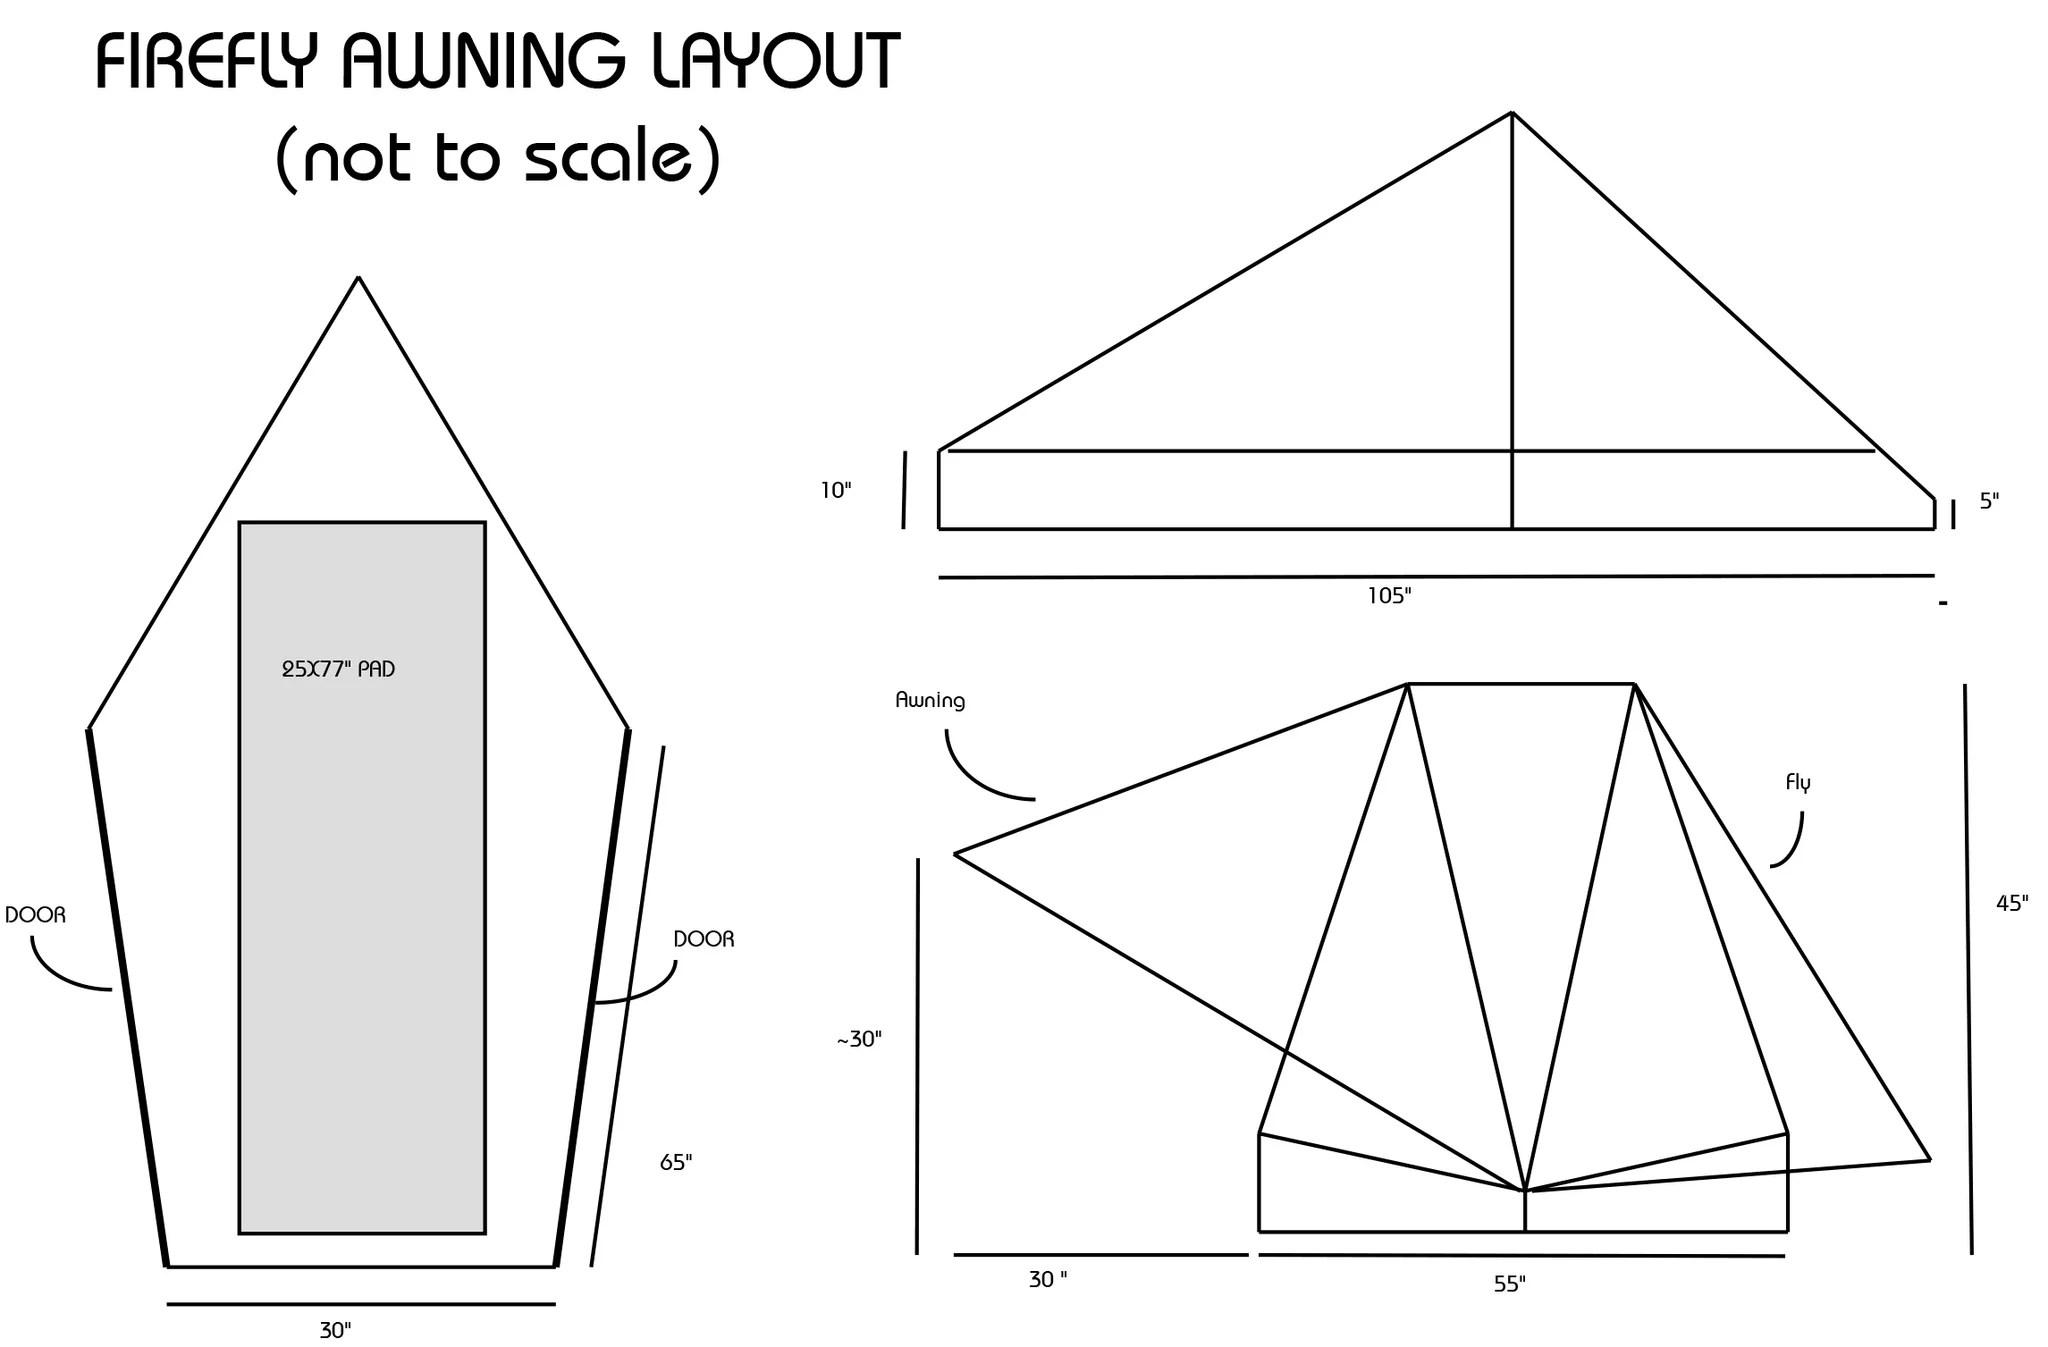 medium resolution of  lightheart firefly awning tent